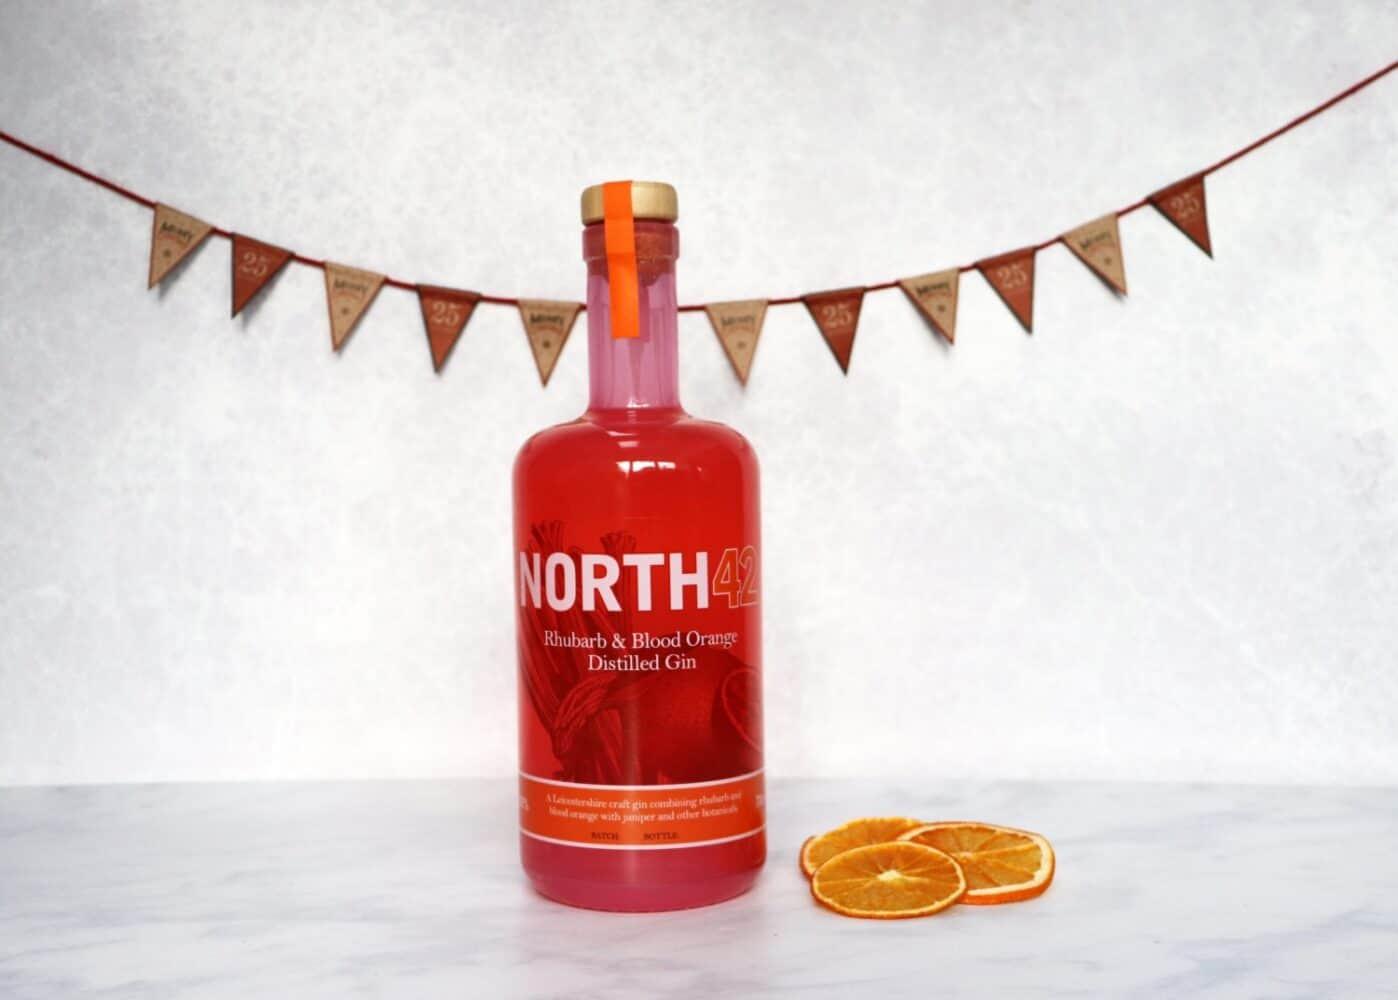 North42 Rhubarb & Blood Orange Gin